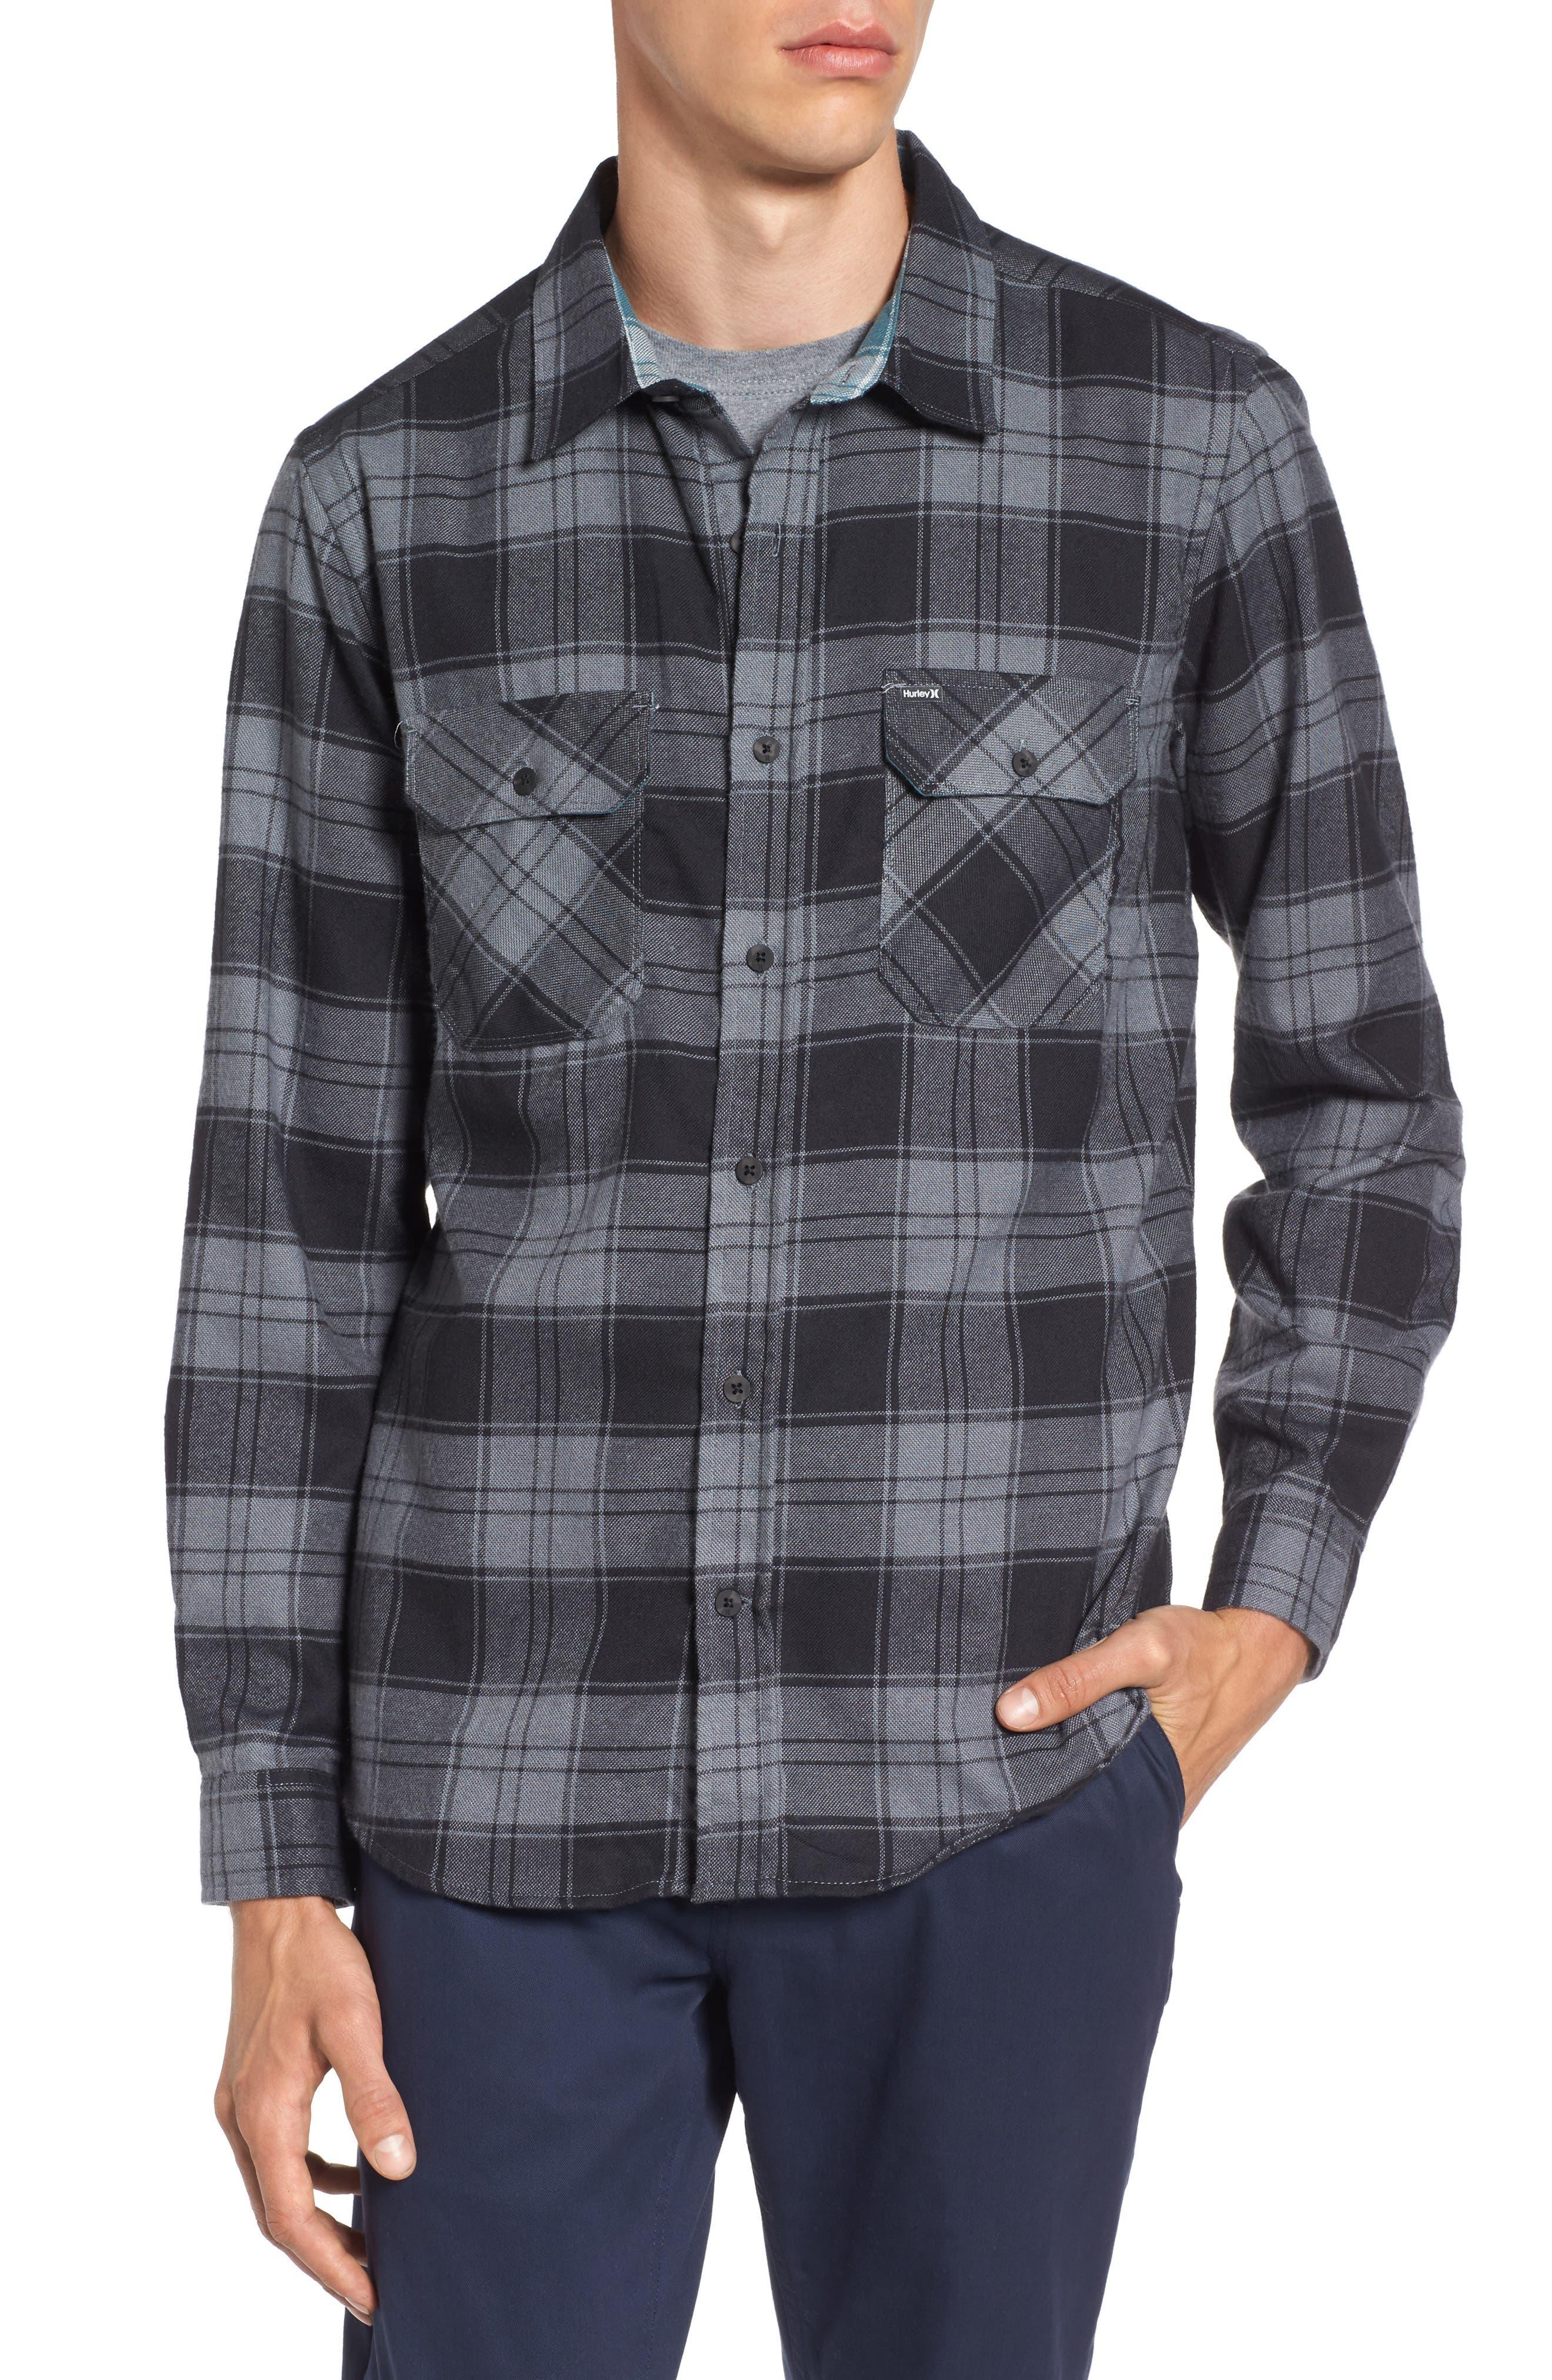 Hurley Check Dri-FIT Shirt